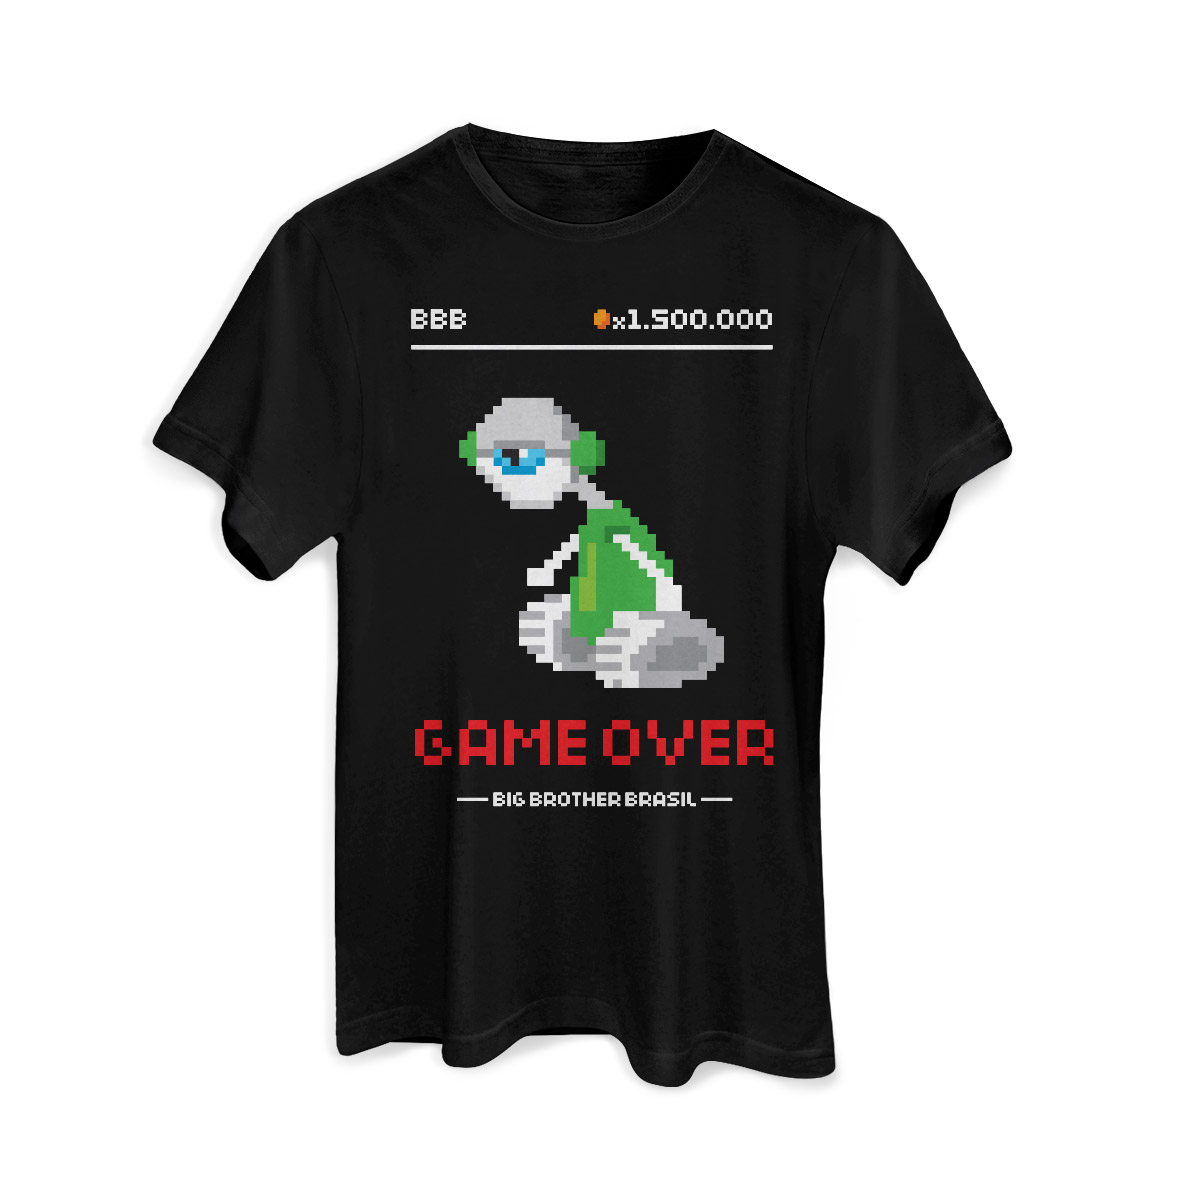 Camiseta Masculina Big Brother Brasil 15 Game Over